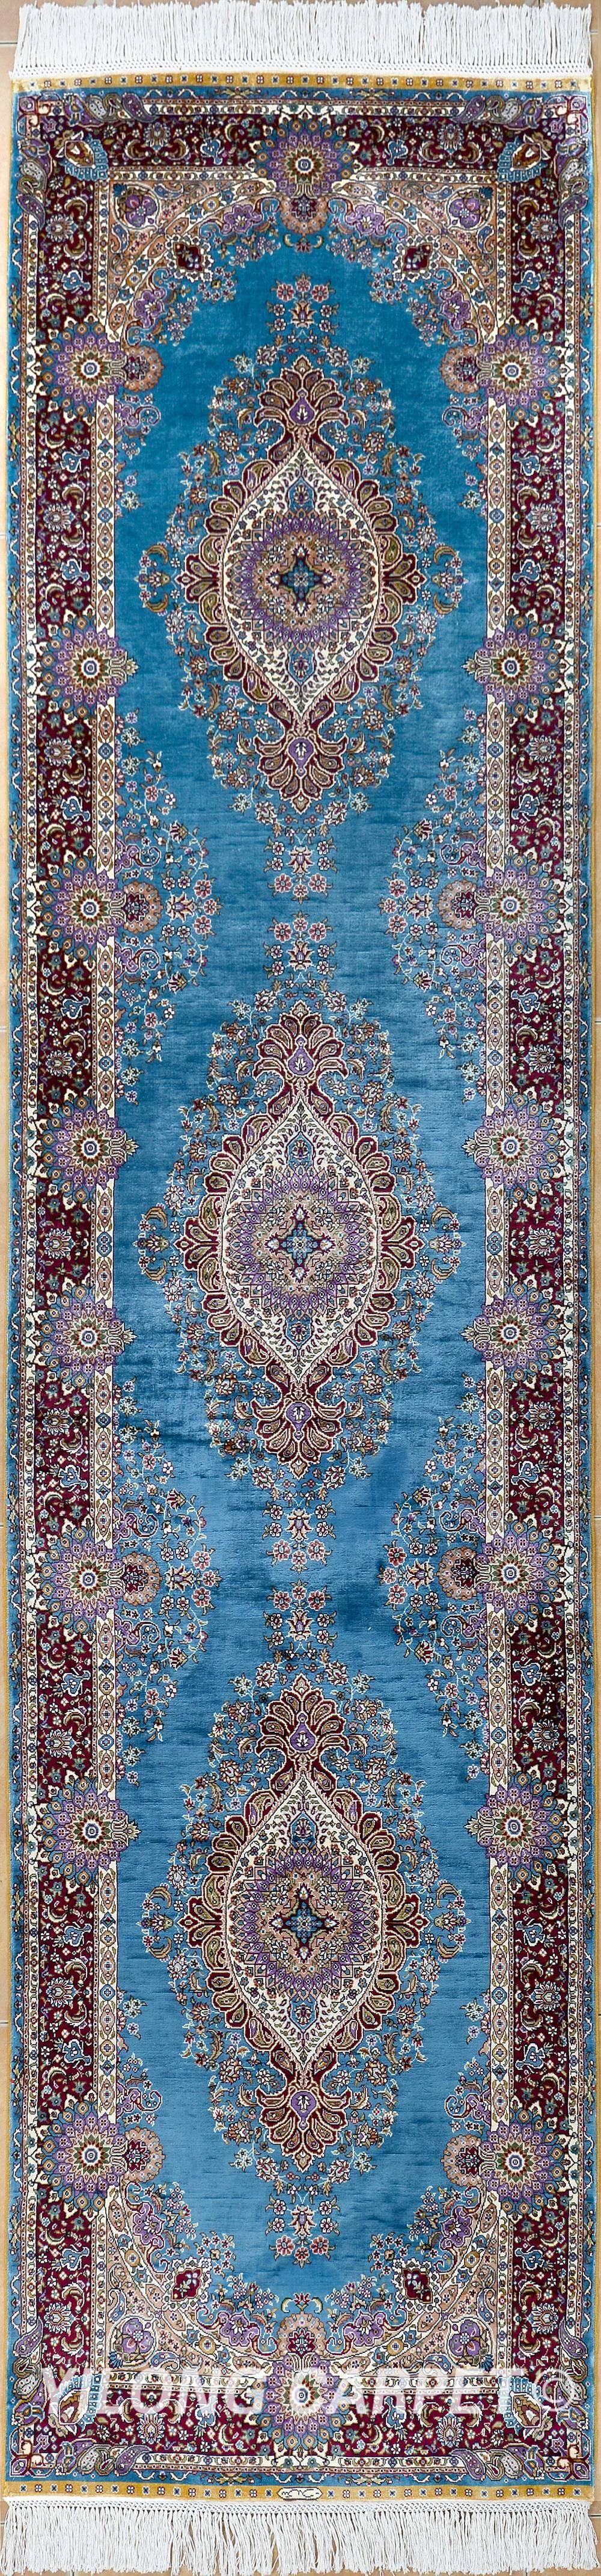 Anti Slip For Carpet Runners Carpetrunners4ftwidekey 2390210875 Turkish Carpet